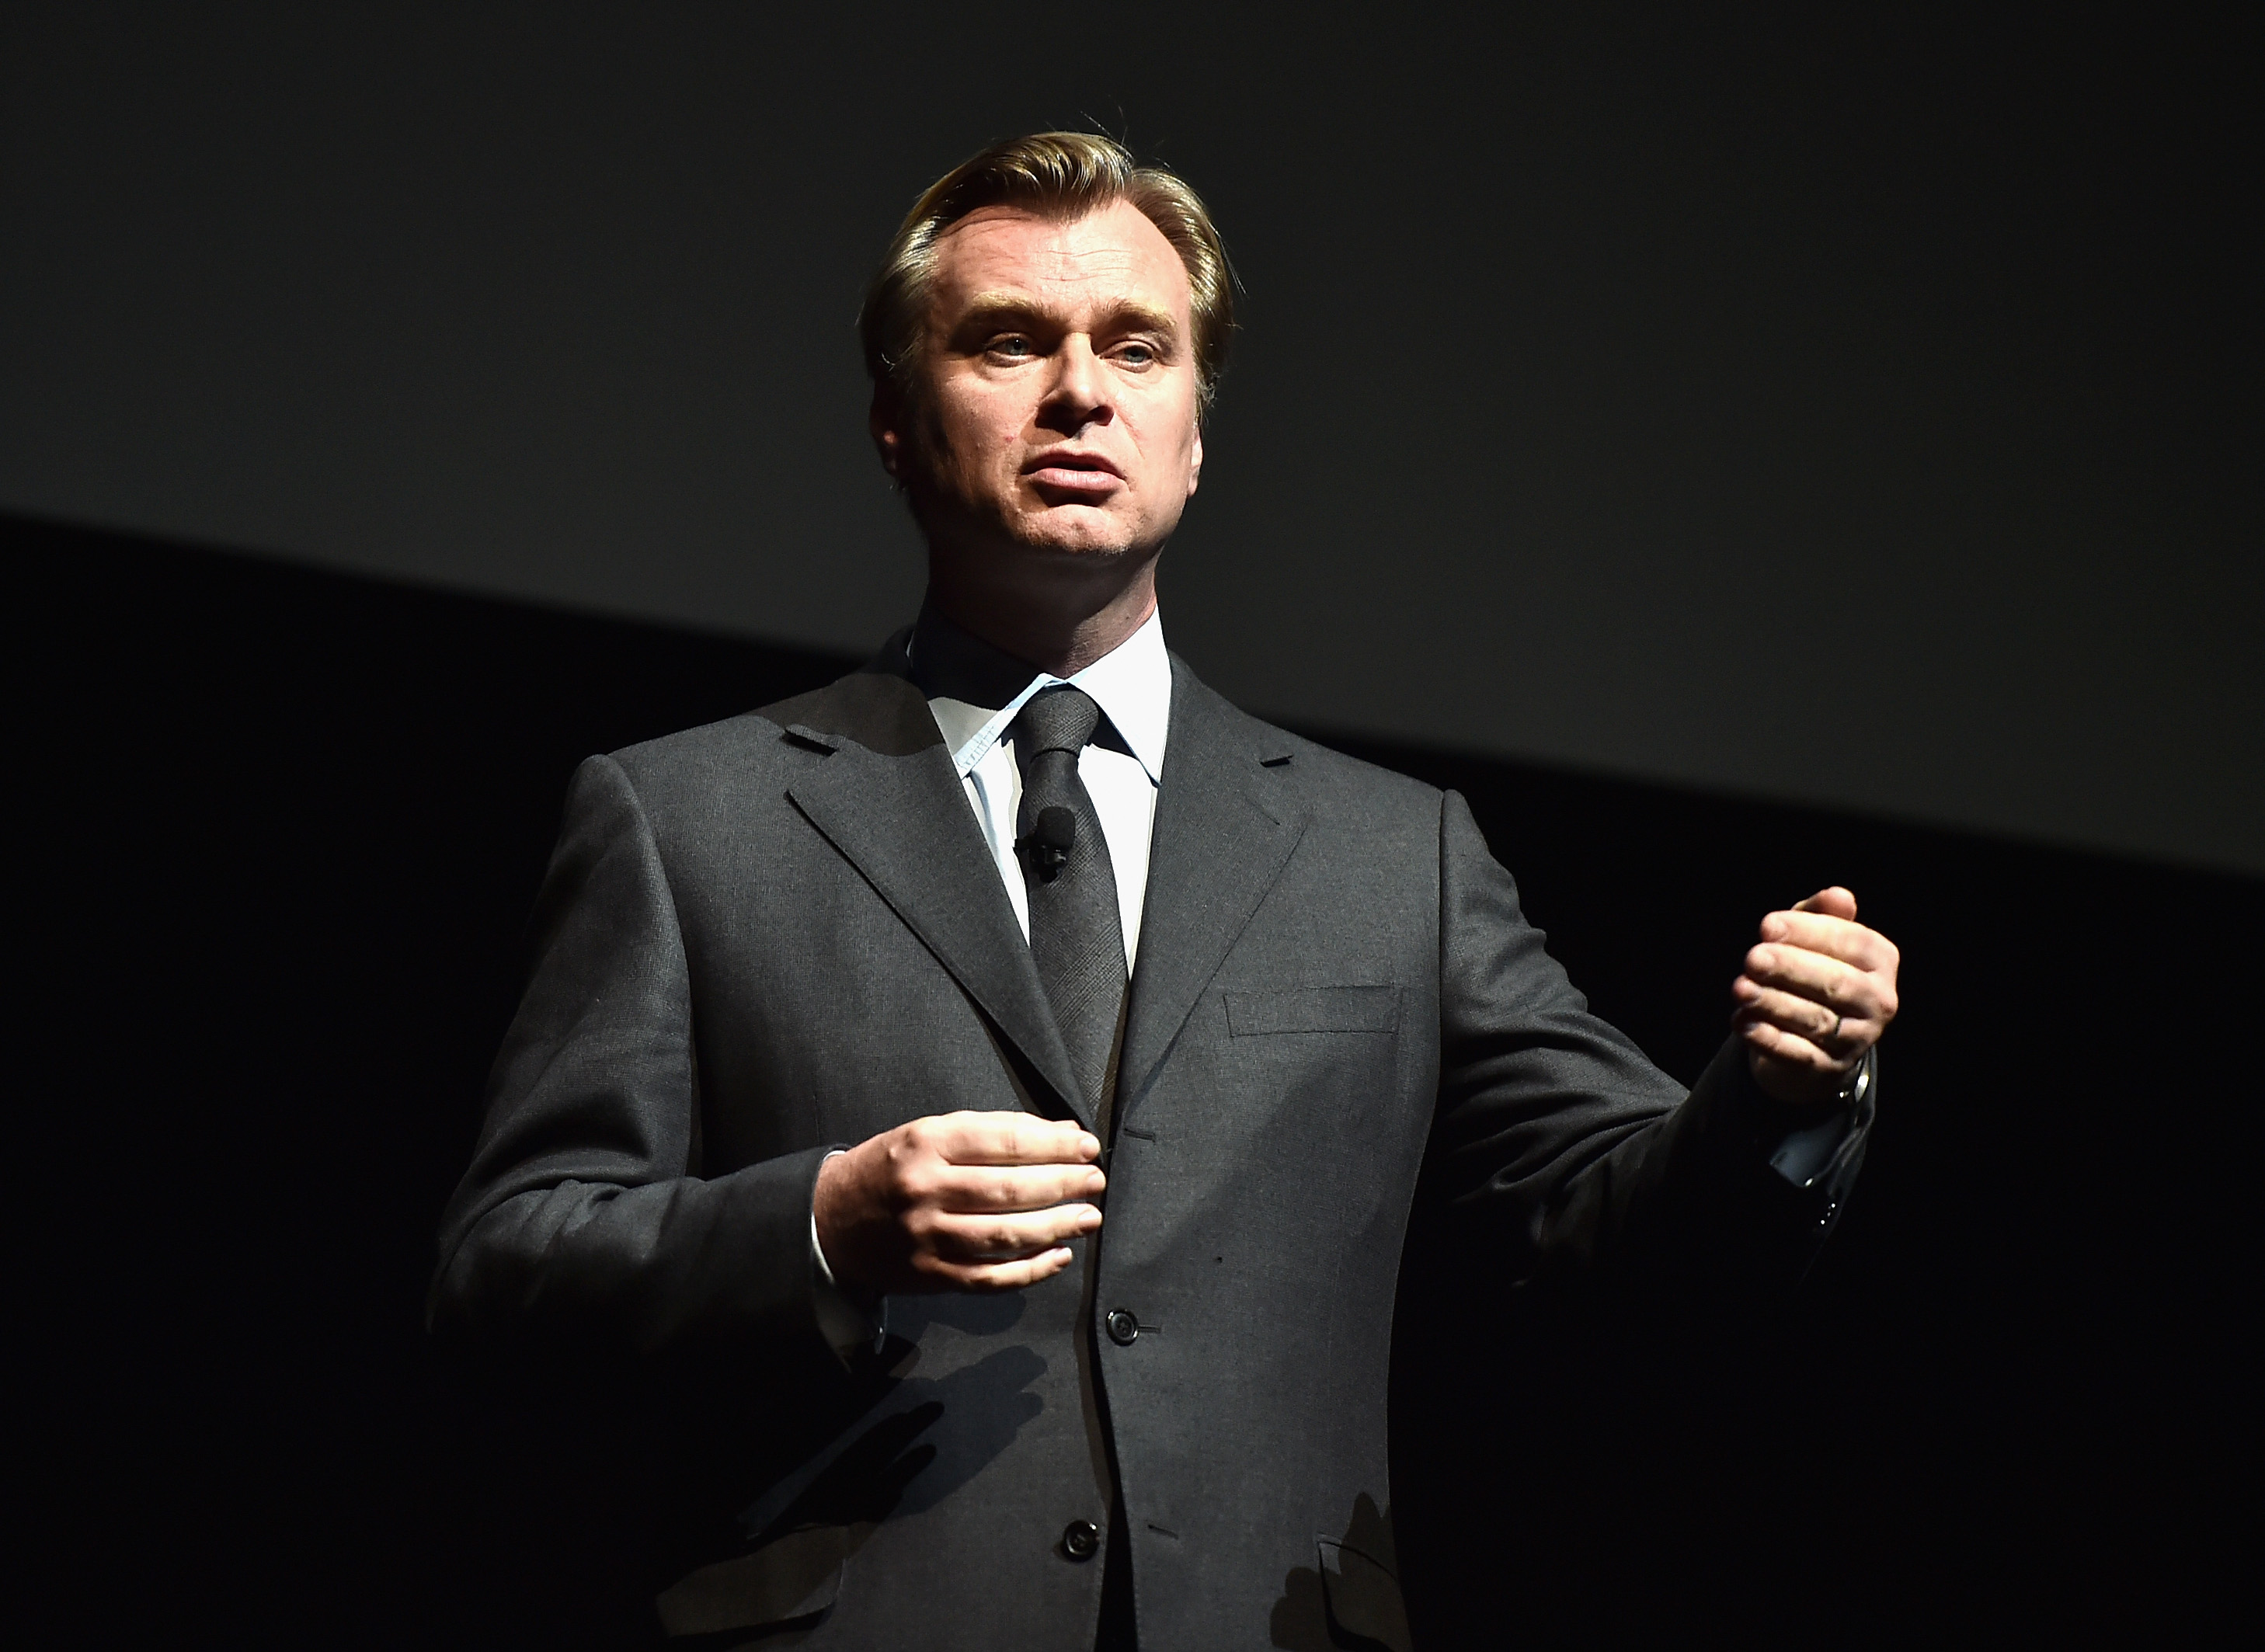 Christopher Nolan CinemaCon 2017